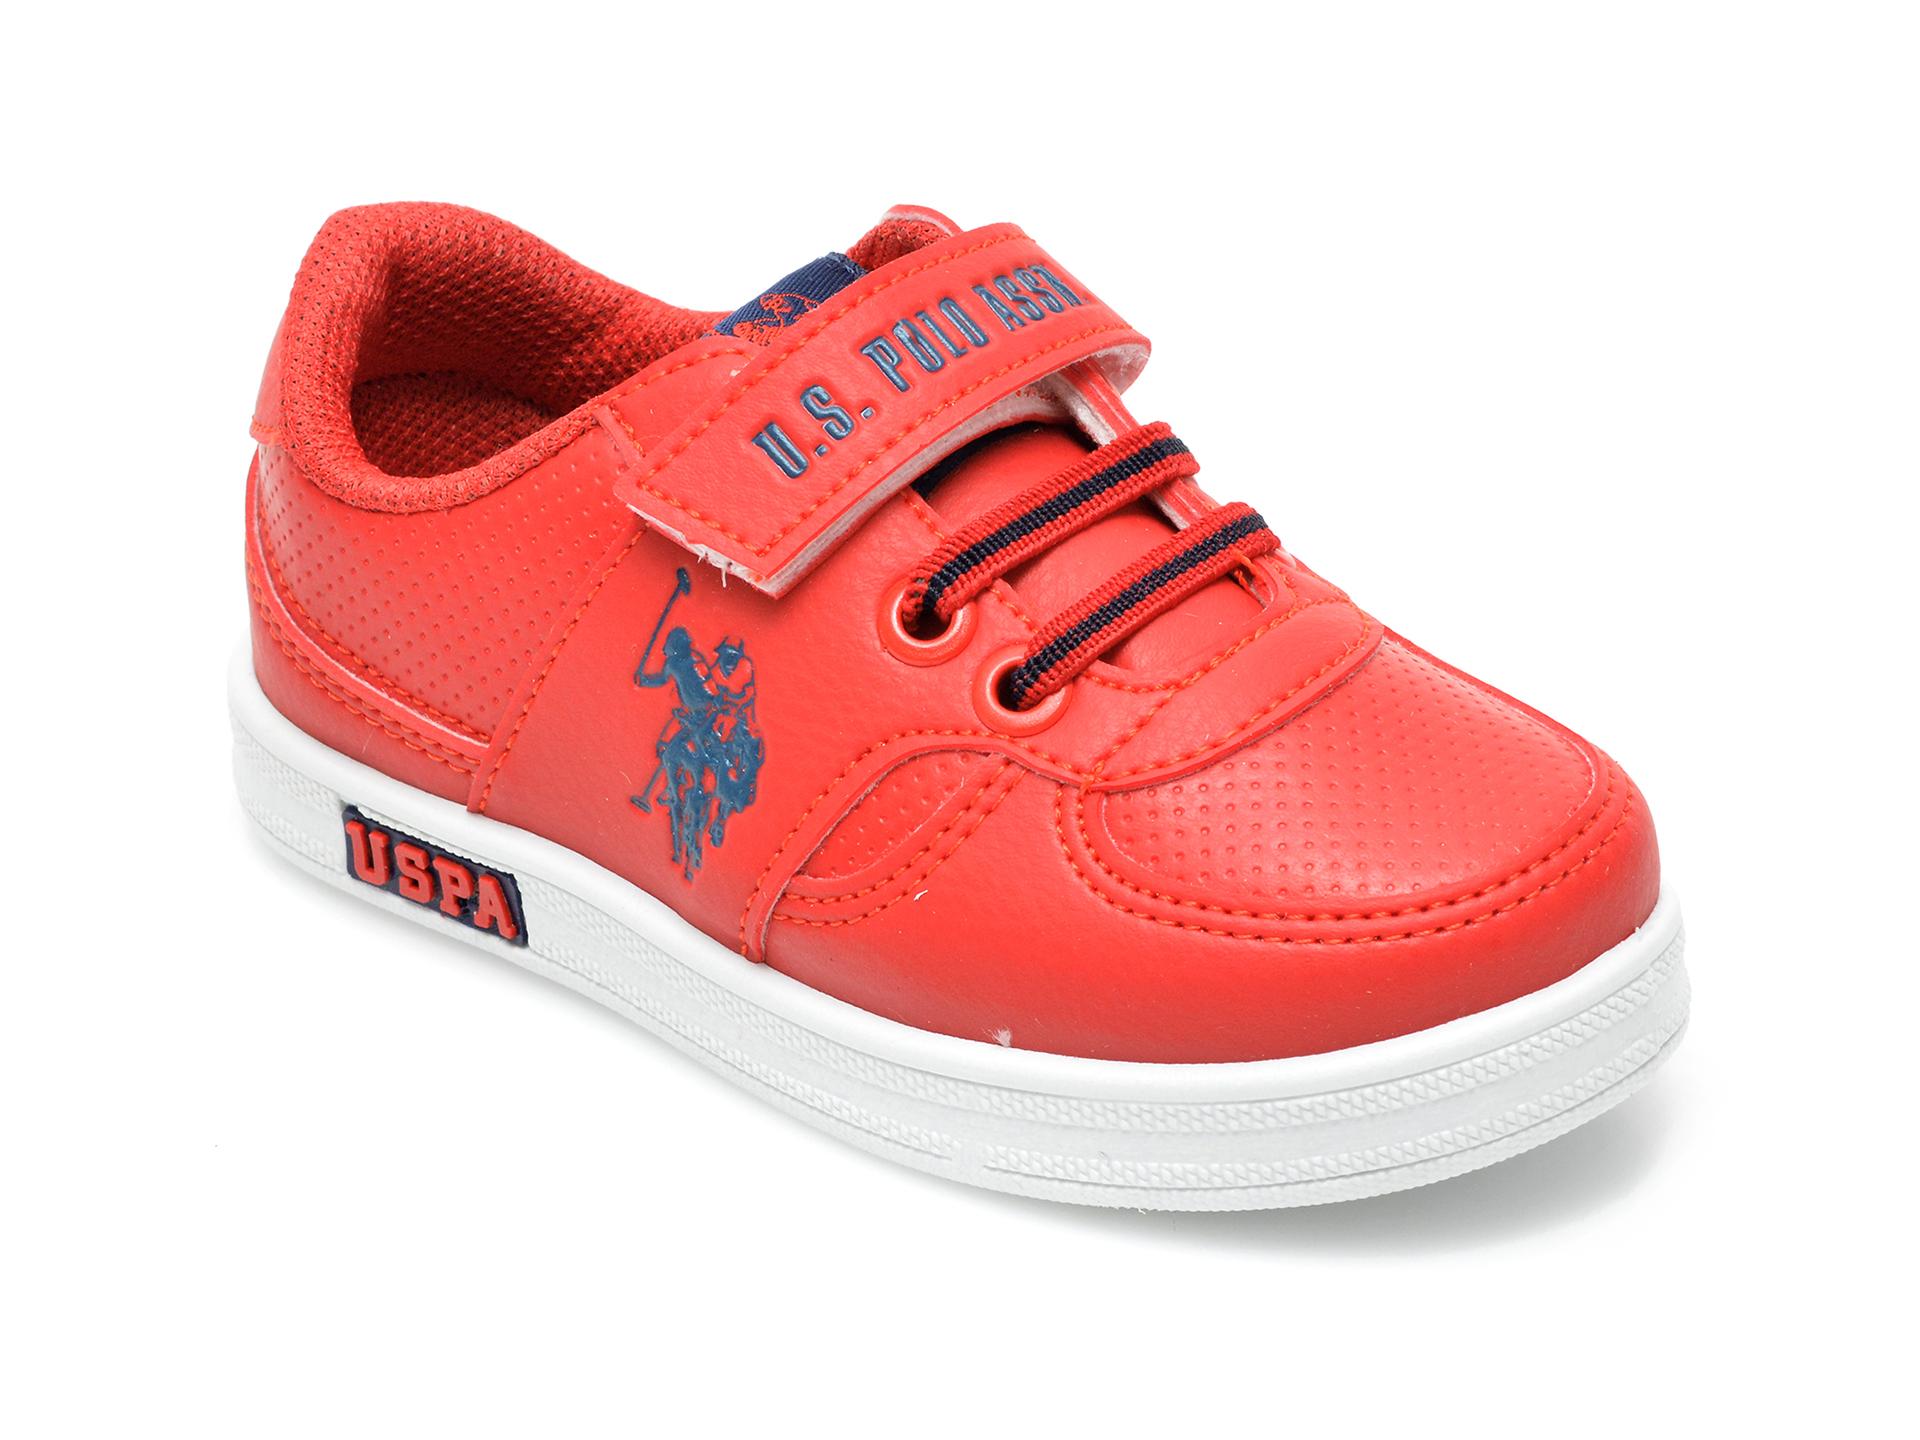 Pantofi sport US POLO ASSN rosii, CAME1FX, din piele ecologica